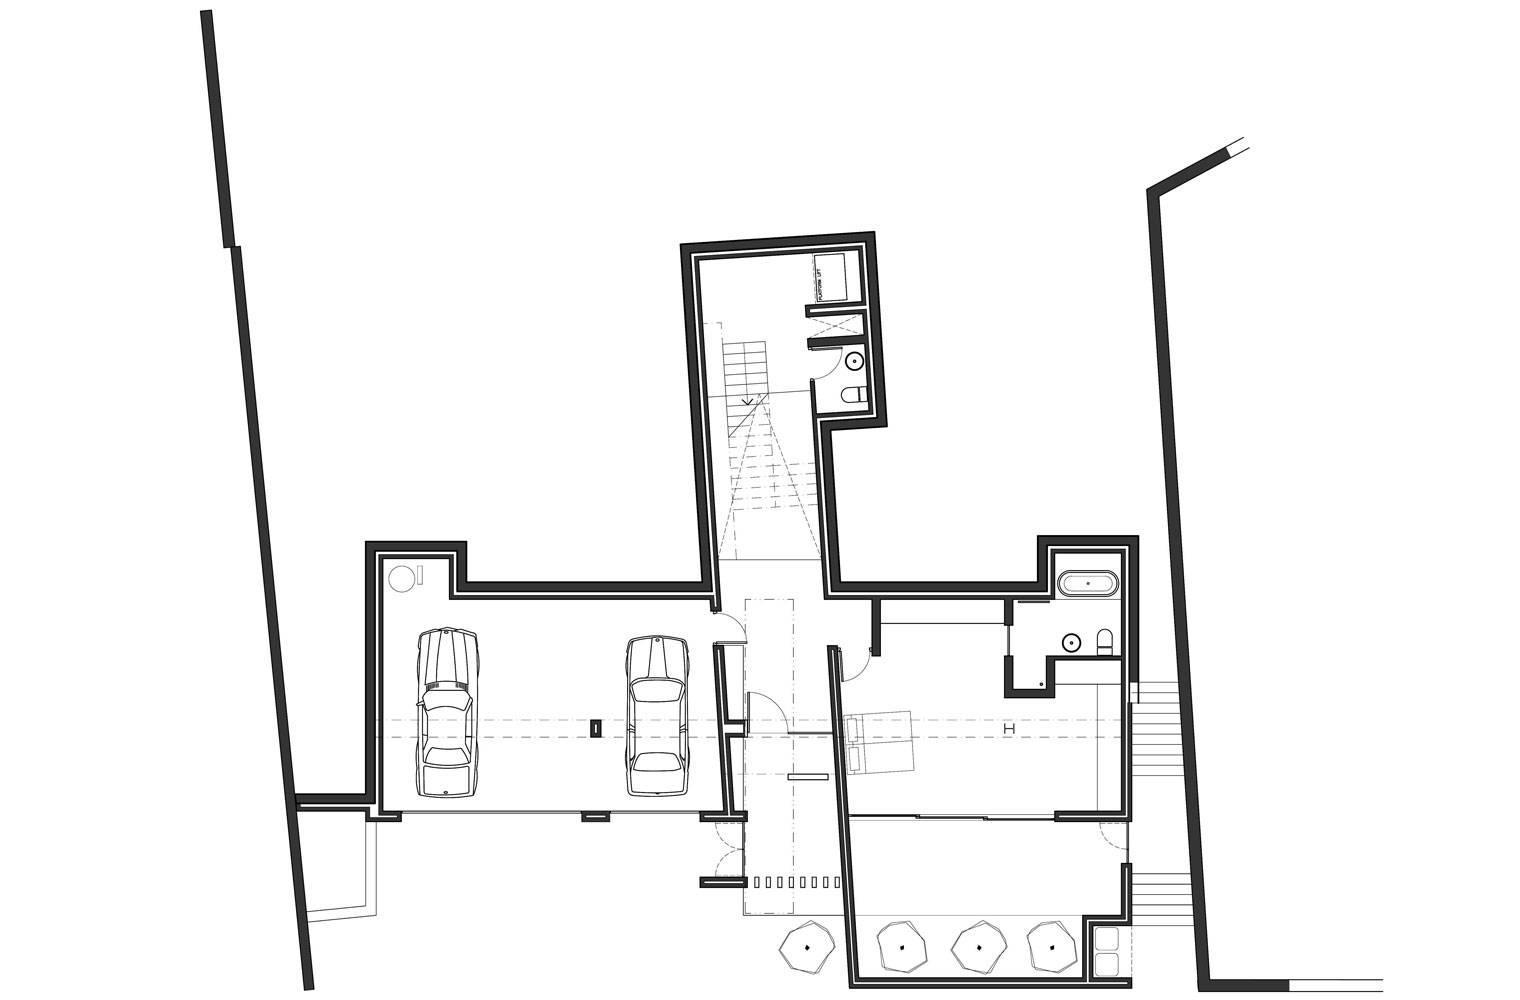 House Ferraz - Ground Floor Plan